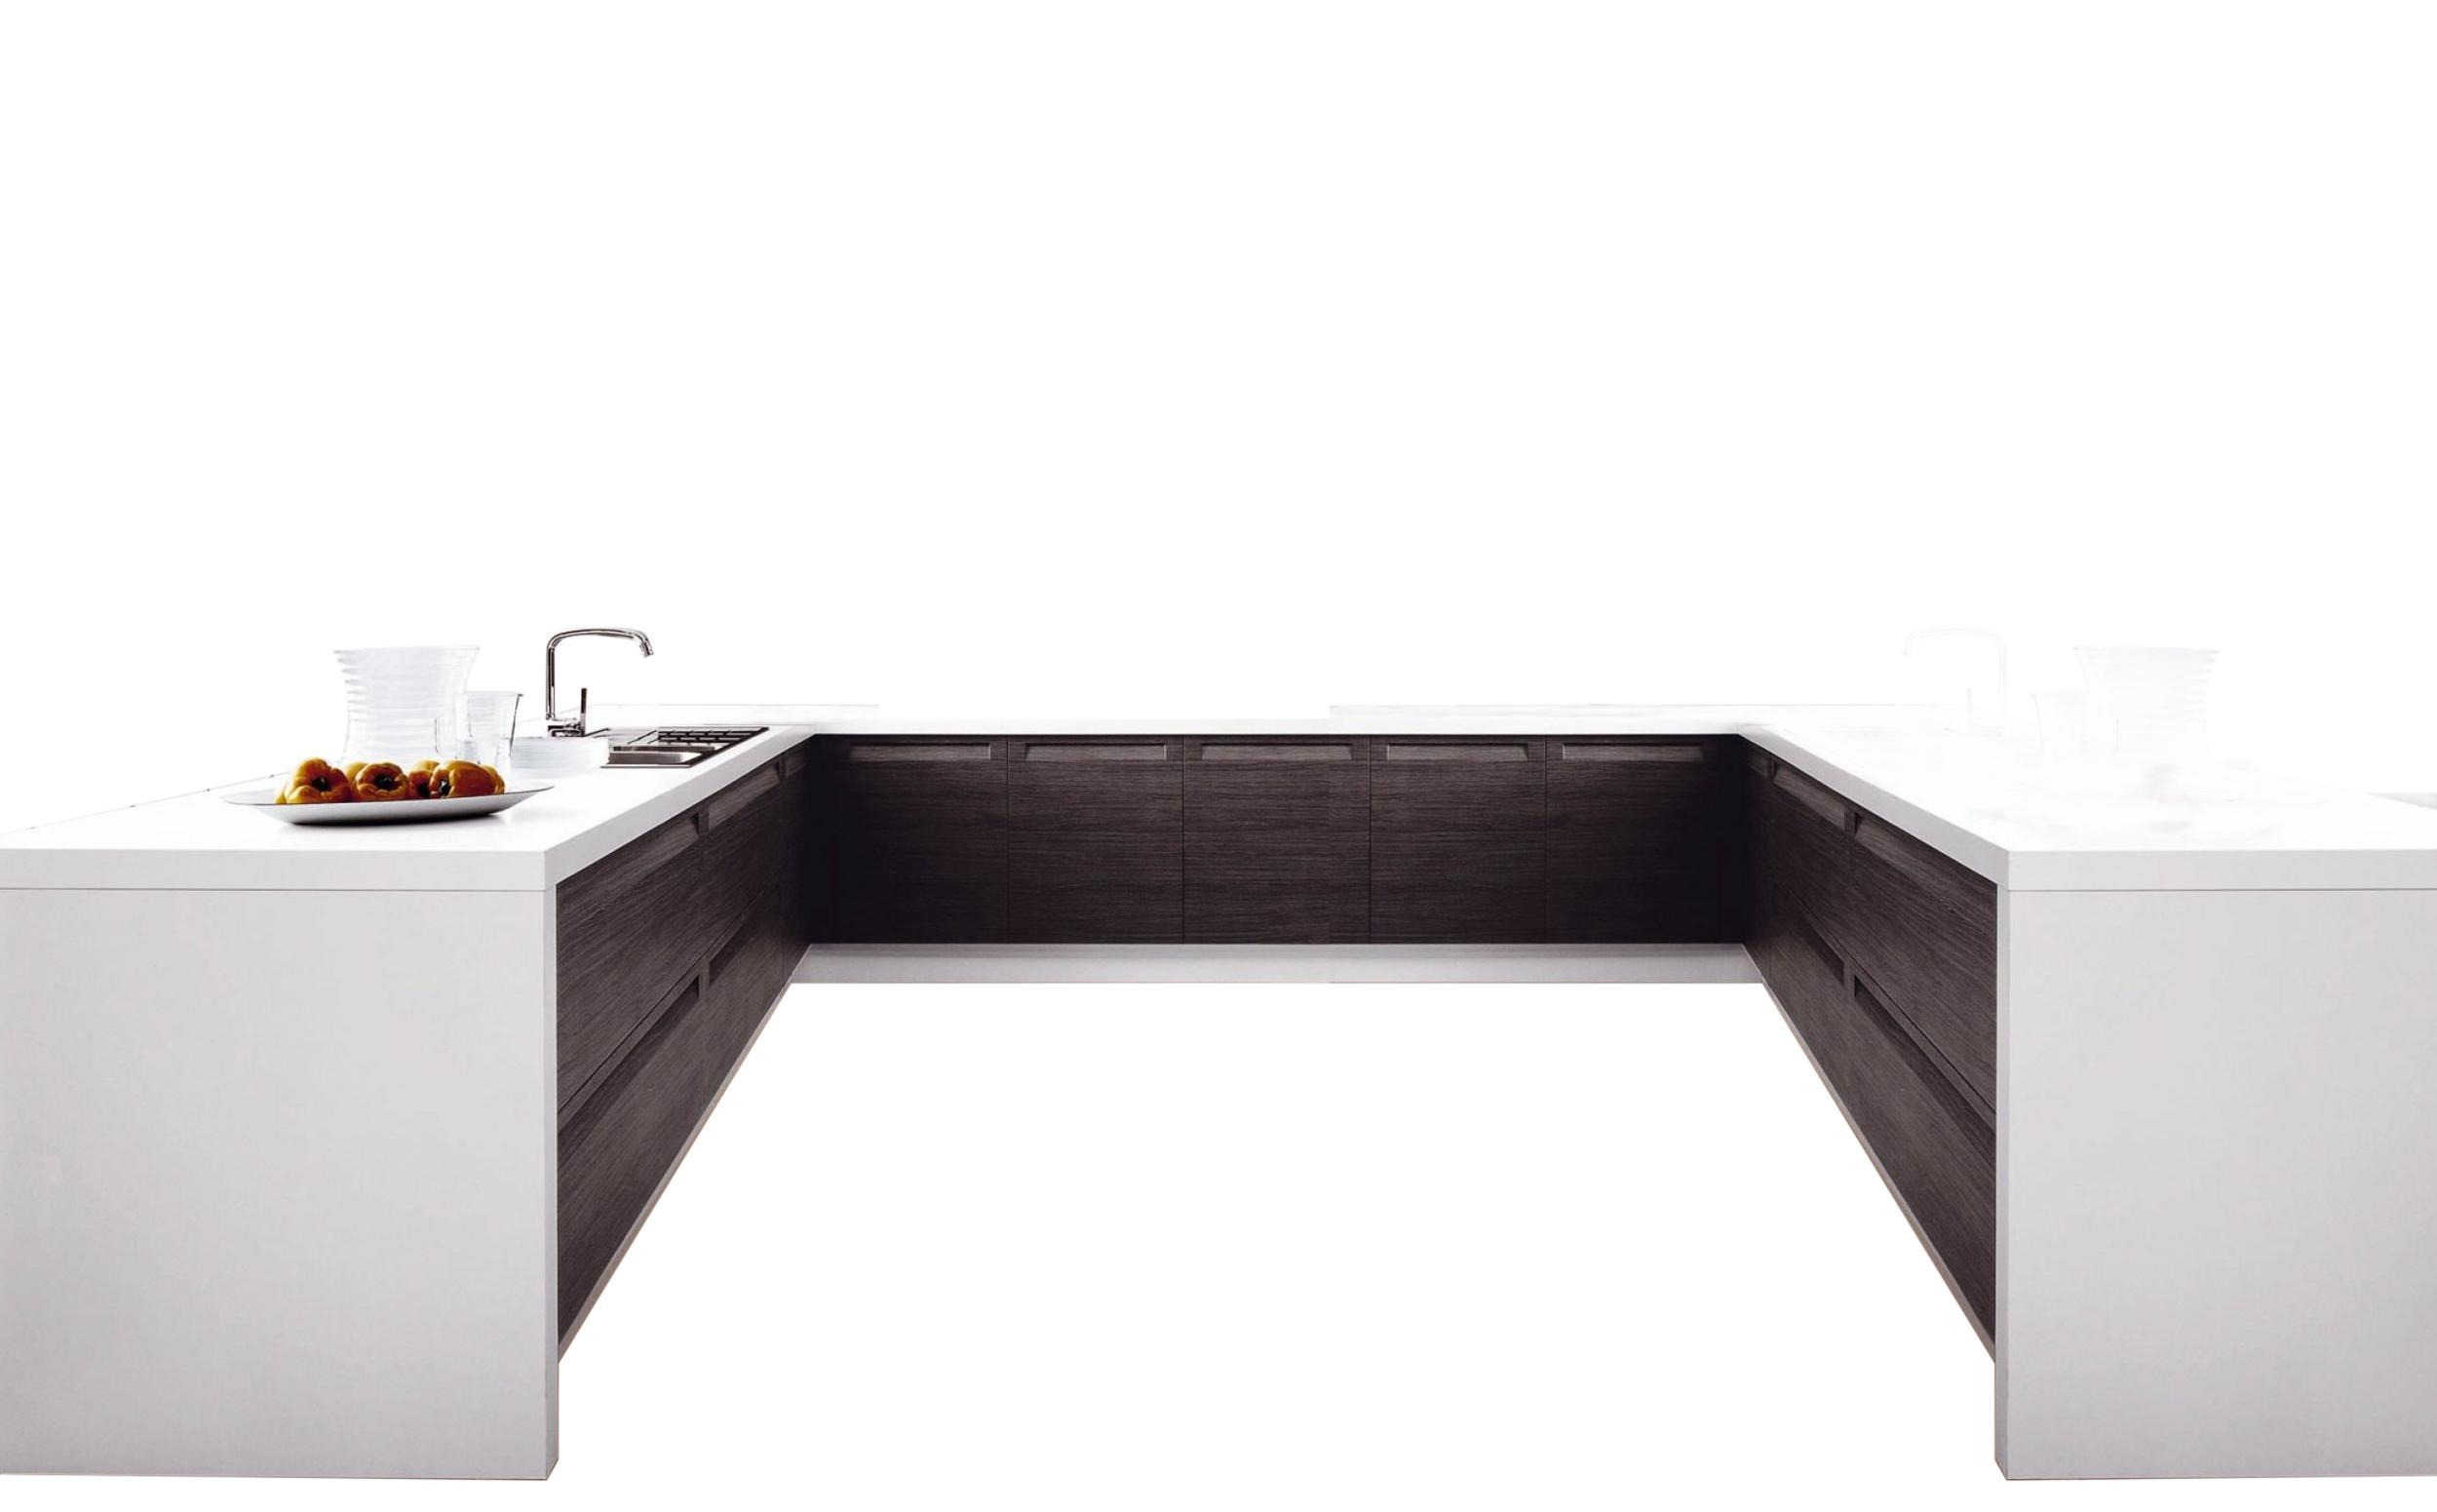 ideas-kitchen-minimalist-u-shaped-modern-kitchen-design-with-black-and123.png